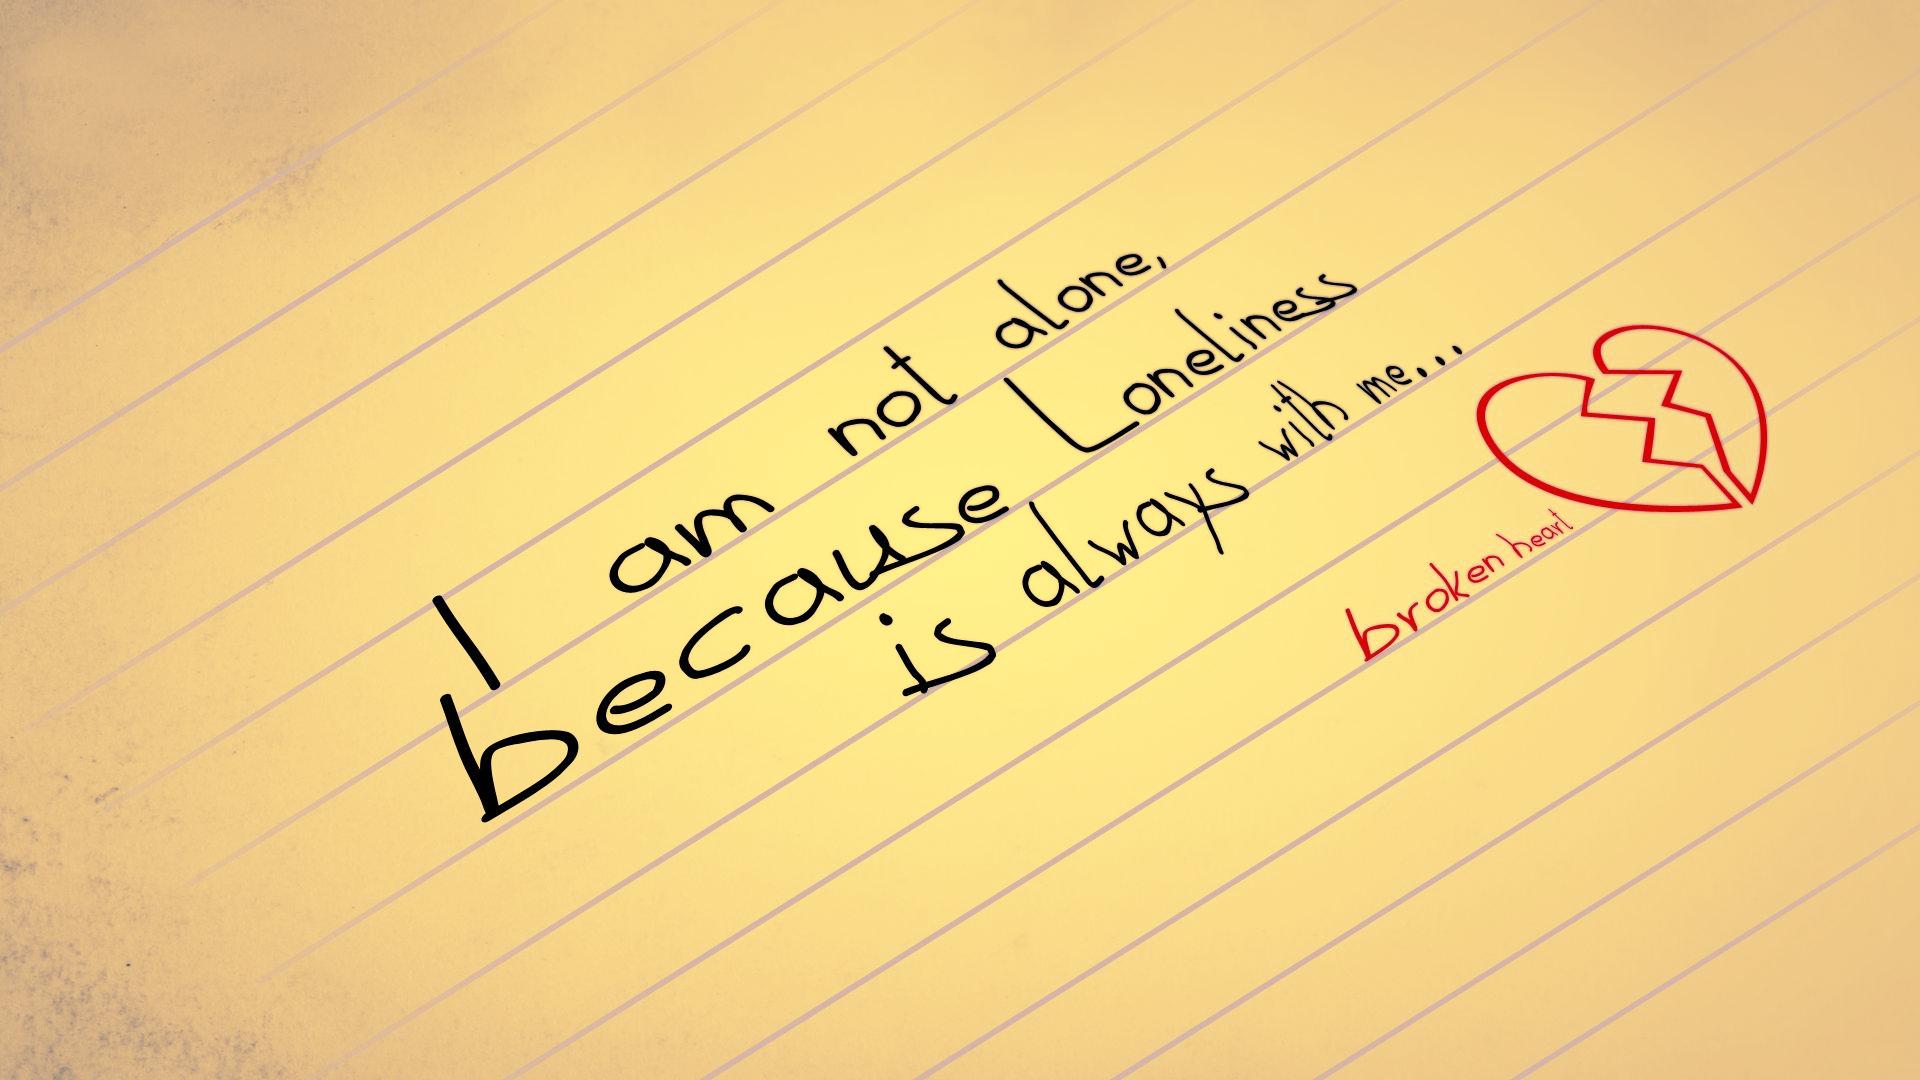 Sad quotes for a broken heart